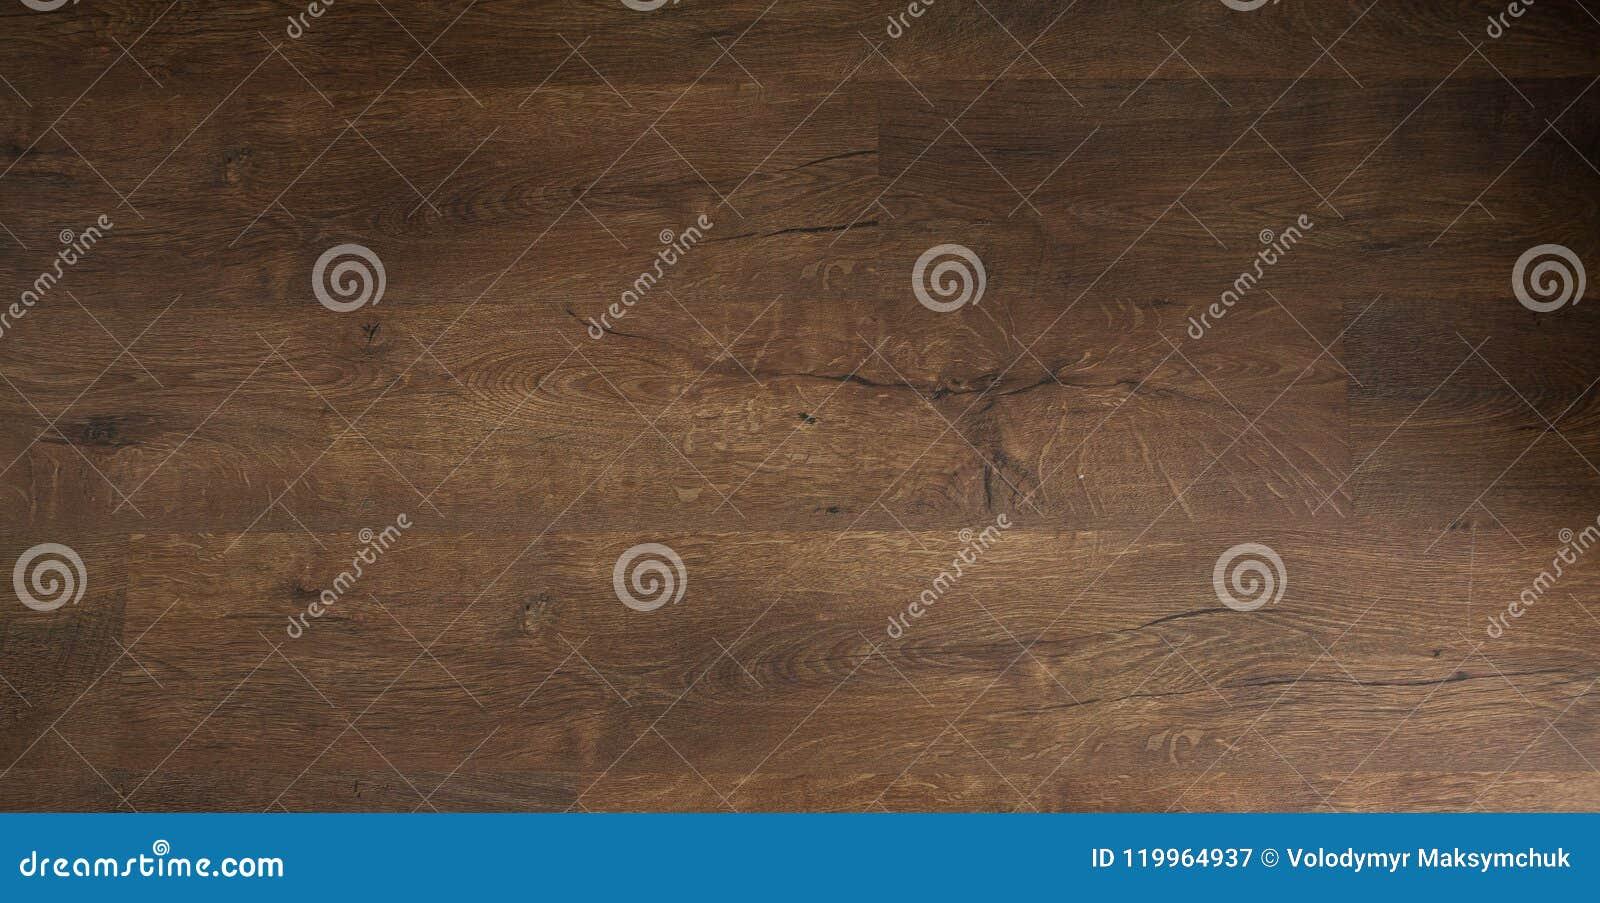 Donkere eiken vloer houten vloer eiken parket houten bevloering